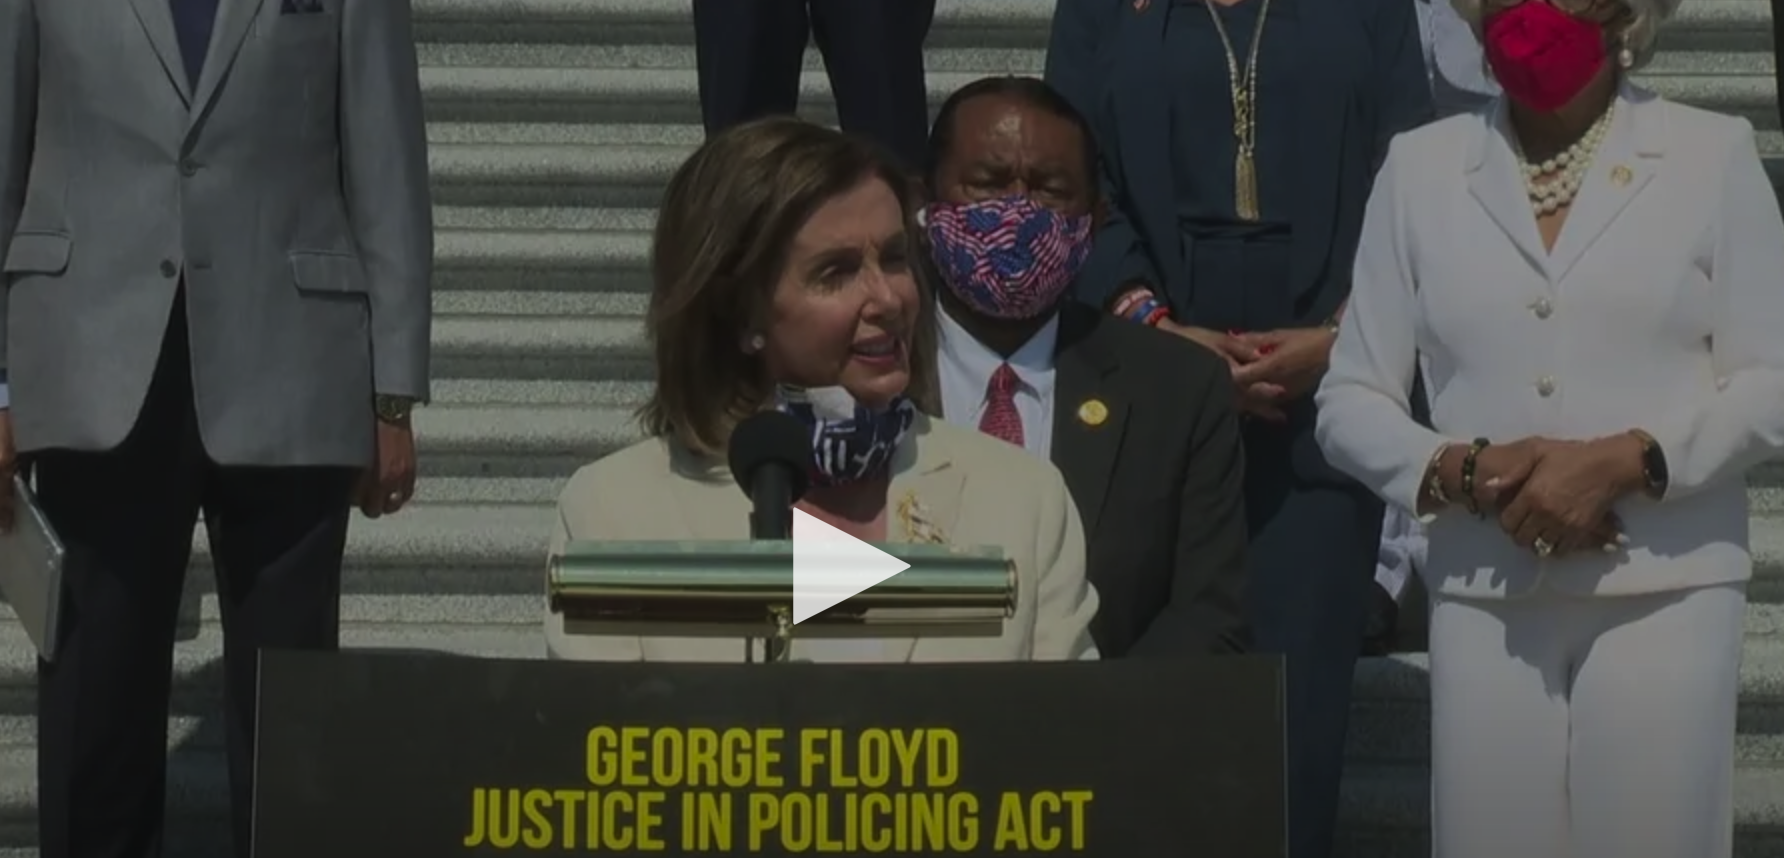 House Democrats Hold News Conference On Police Reform Legislation After Senate Democrats Blocked Senator Scott's JUSTICE Act Reform Bill